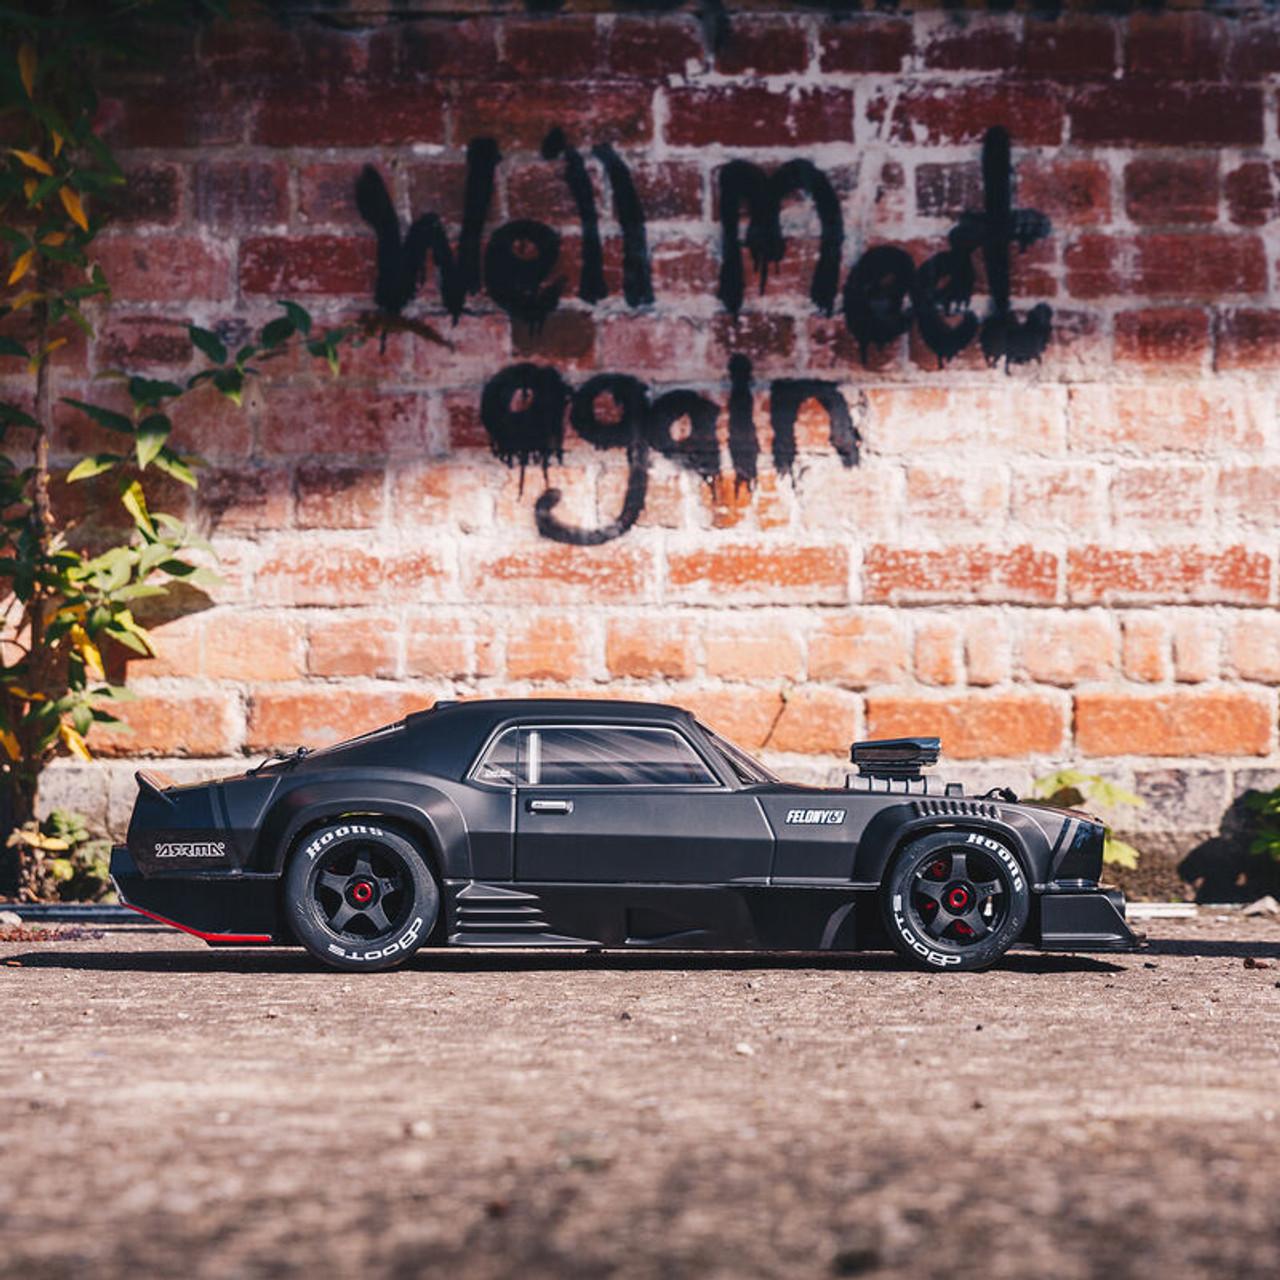 Arrma Felony Resto Mod 6S BLX Street Bash 1/7 4WD RTR, Black